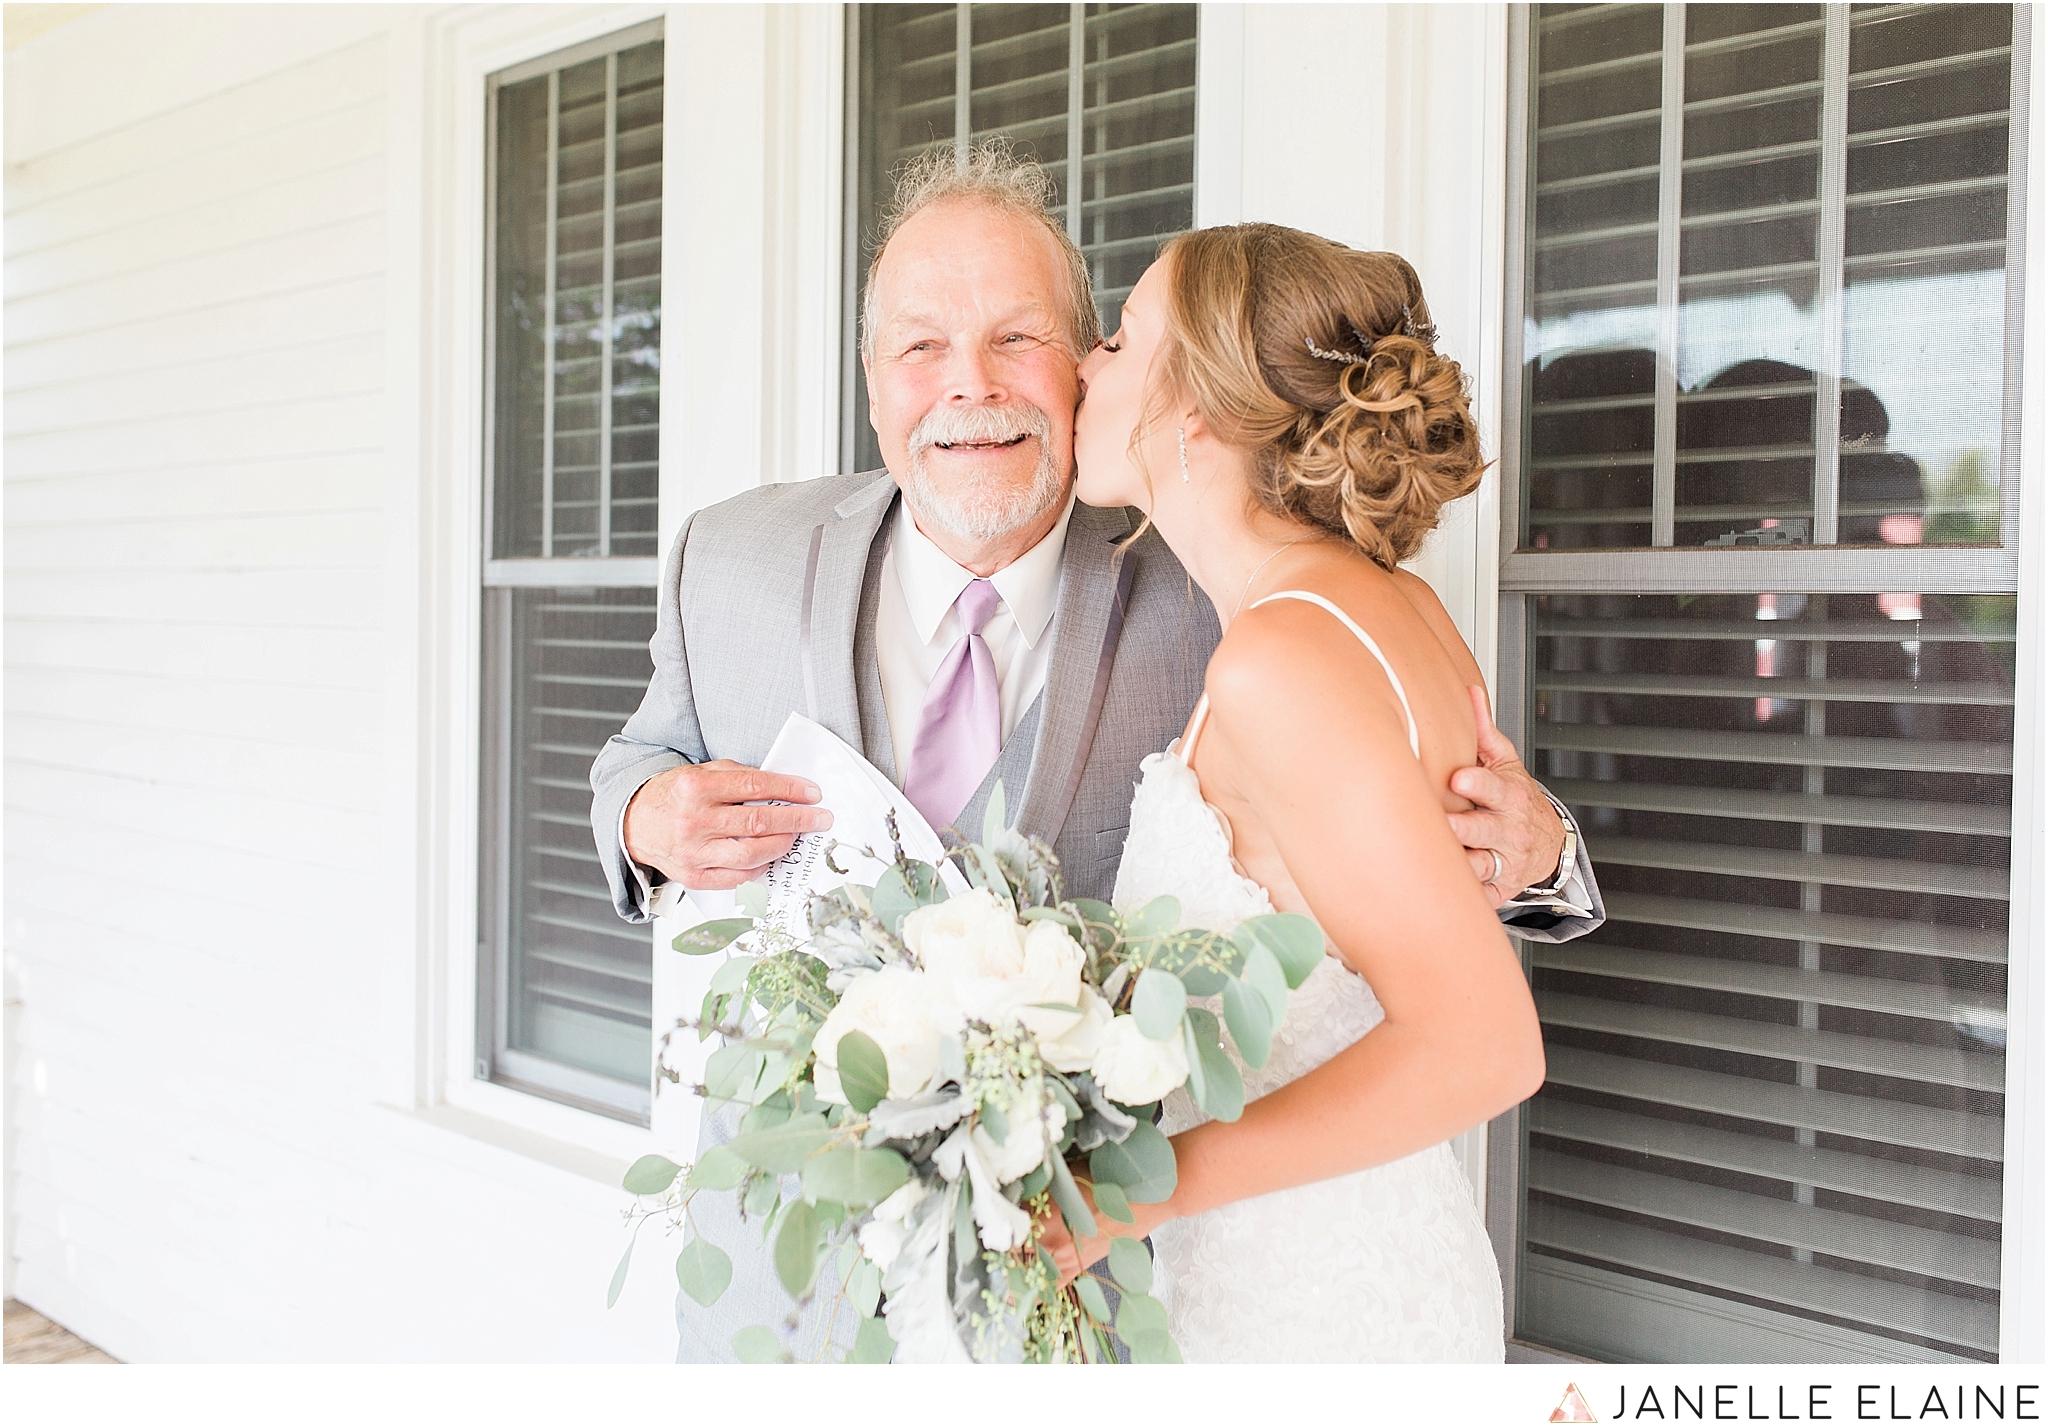 warnsholz-wedding-michigan-photography-janelle elaine photography-150.jpg